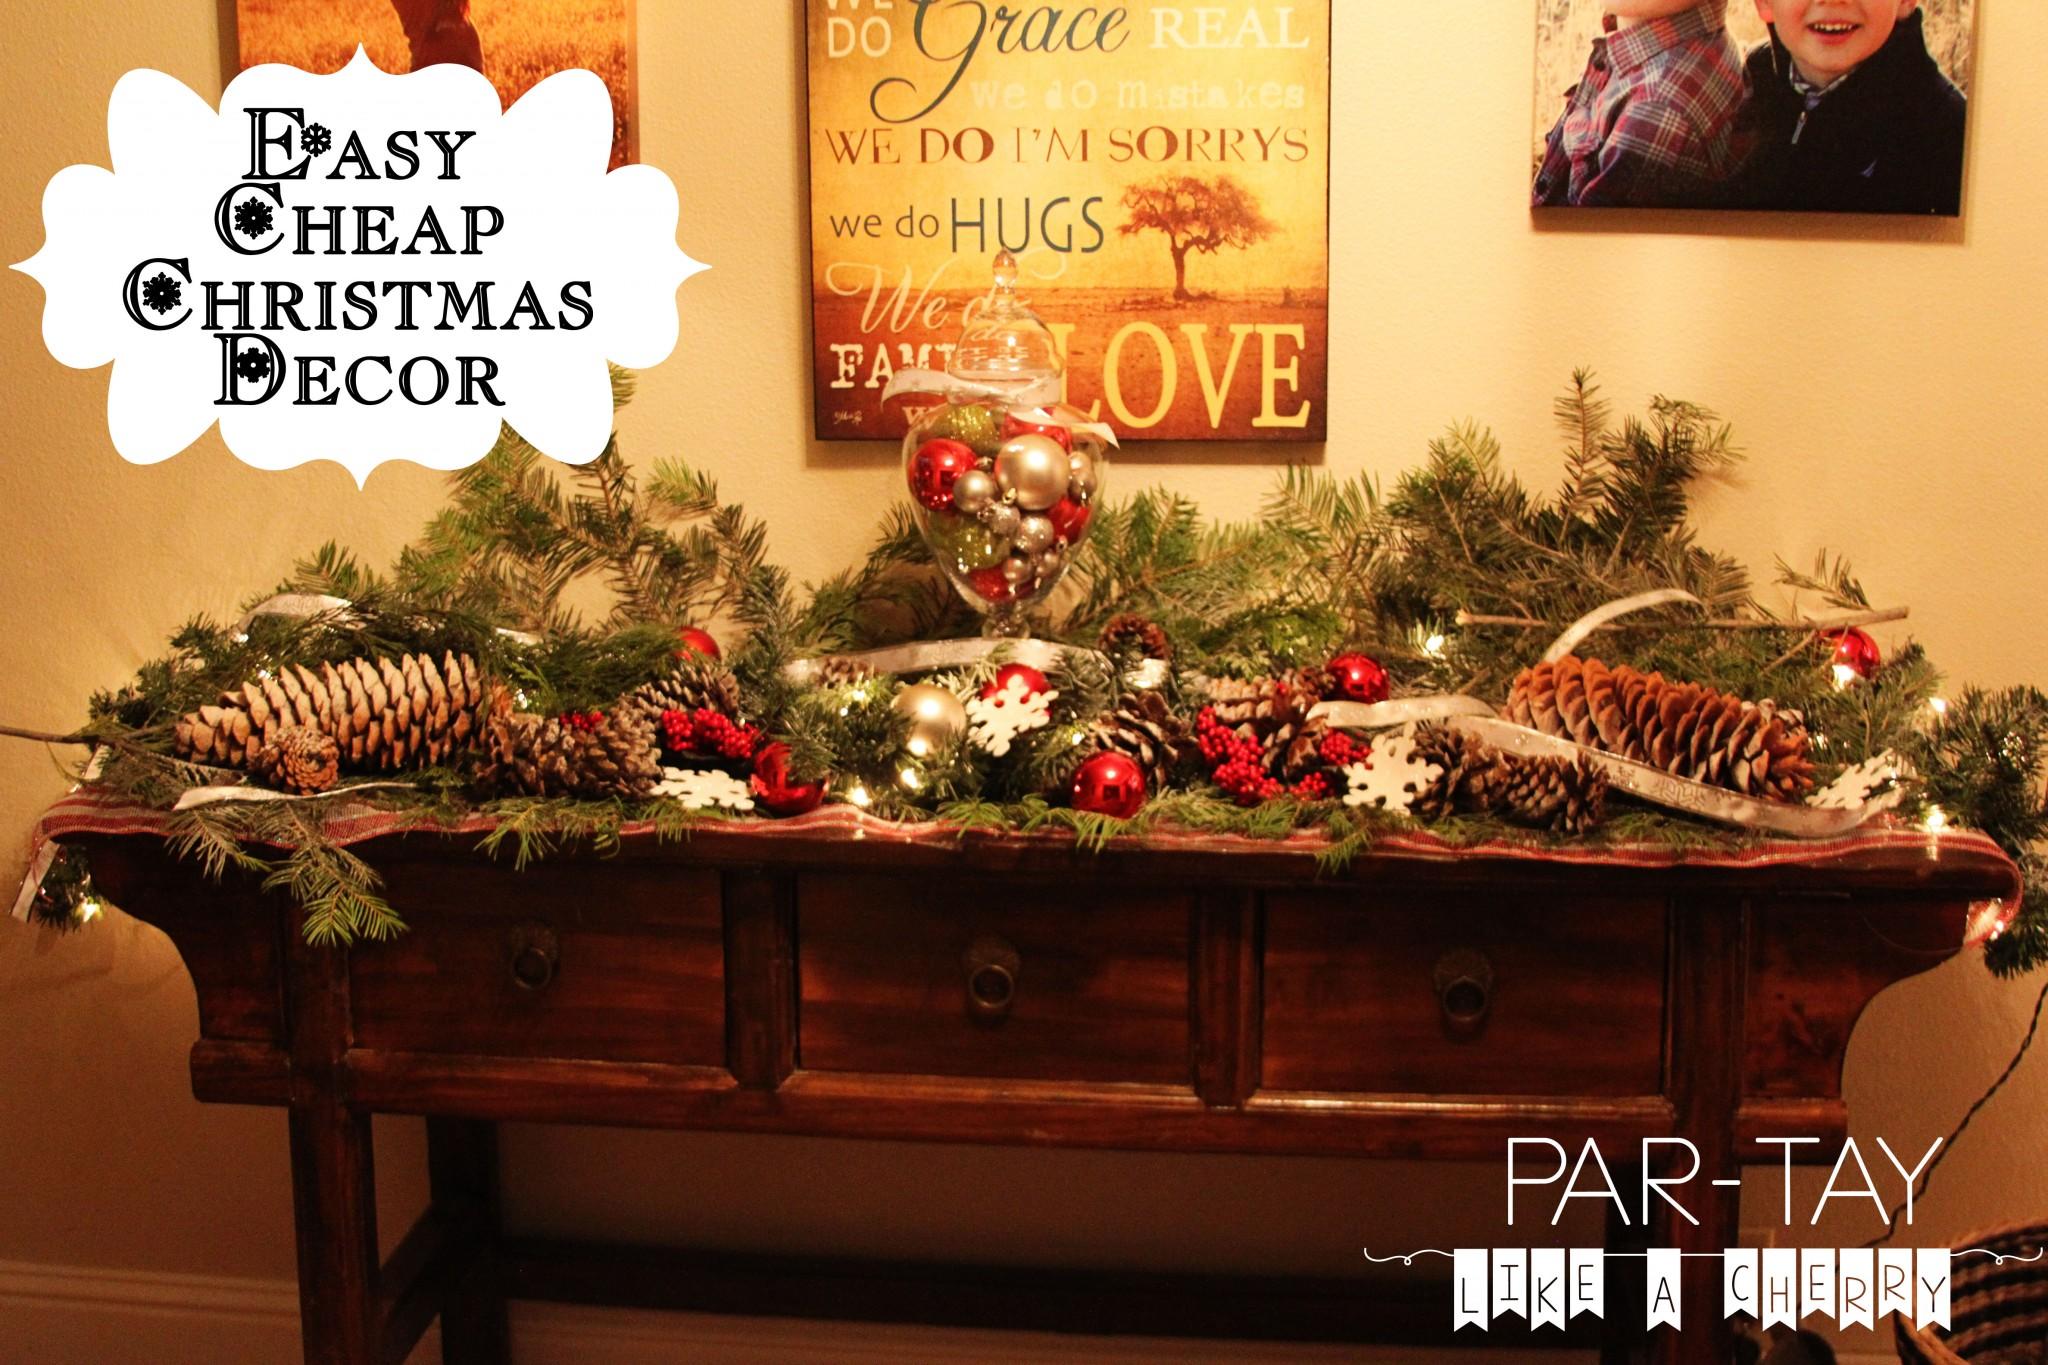 Cheap & Easy Christmas Decor